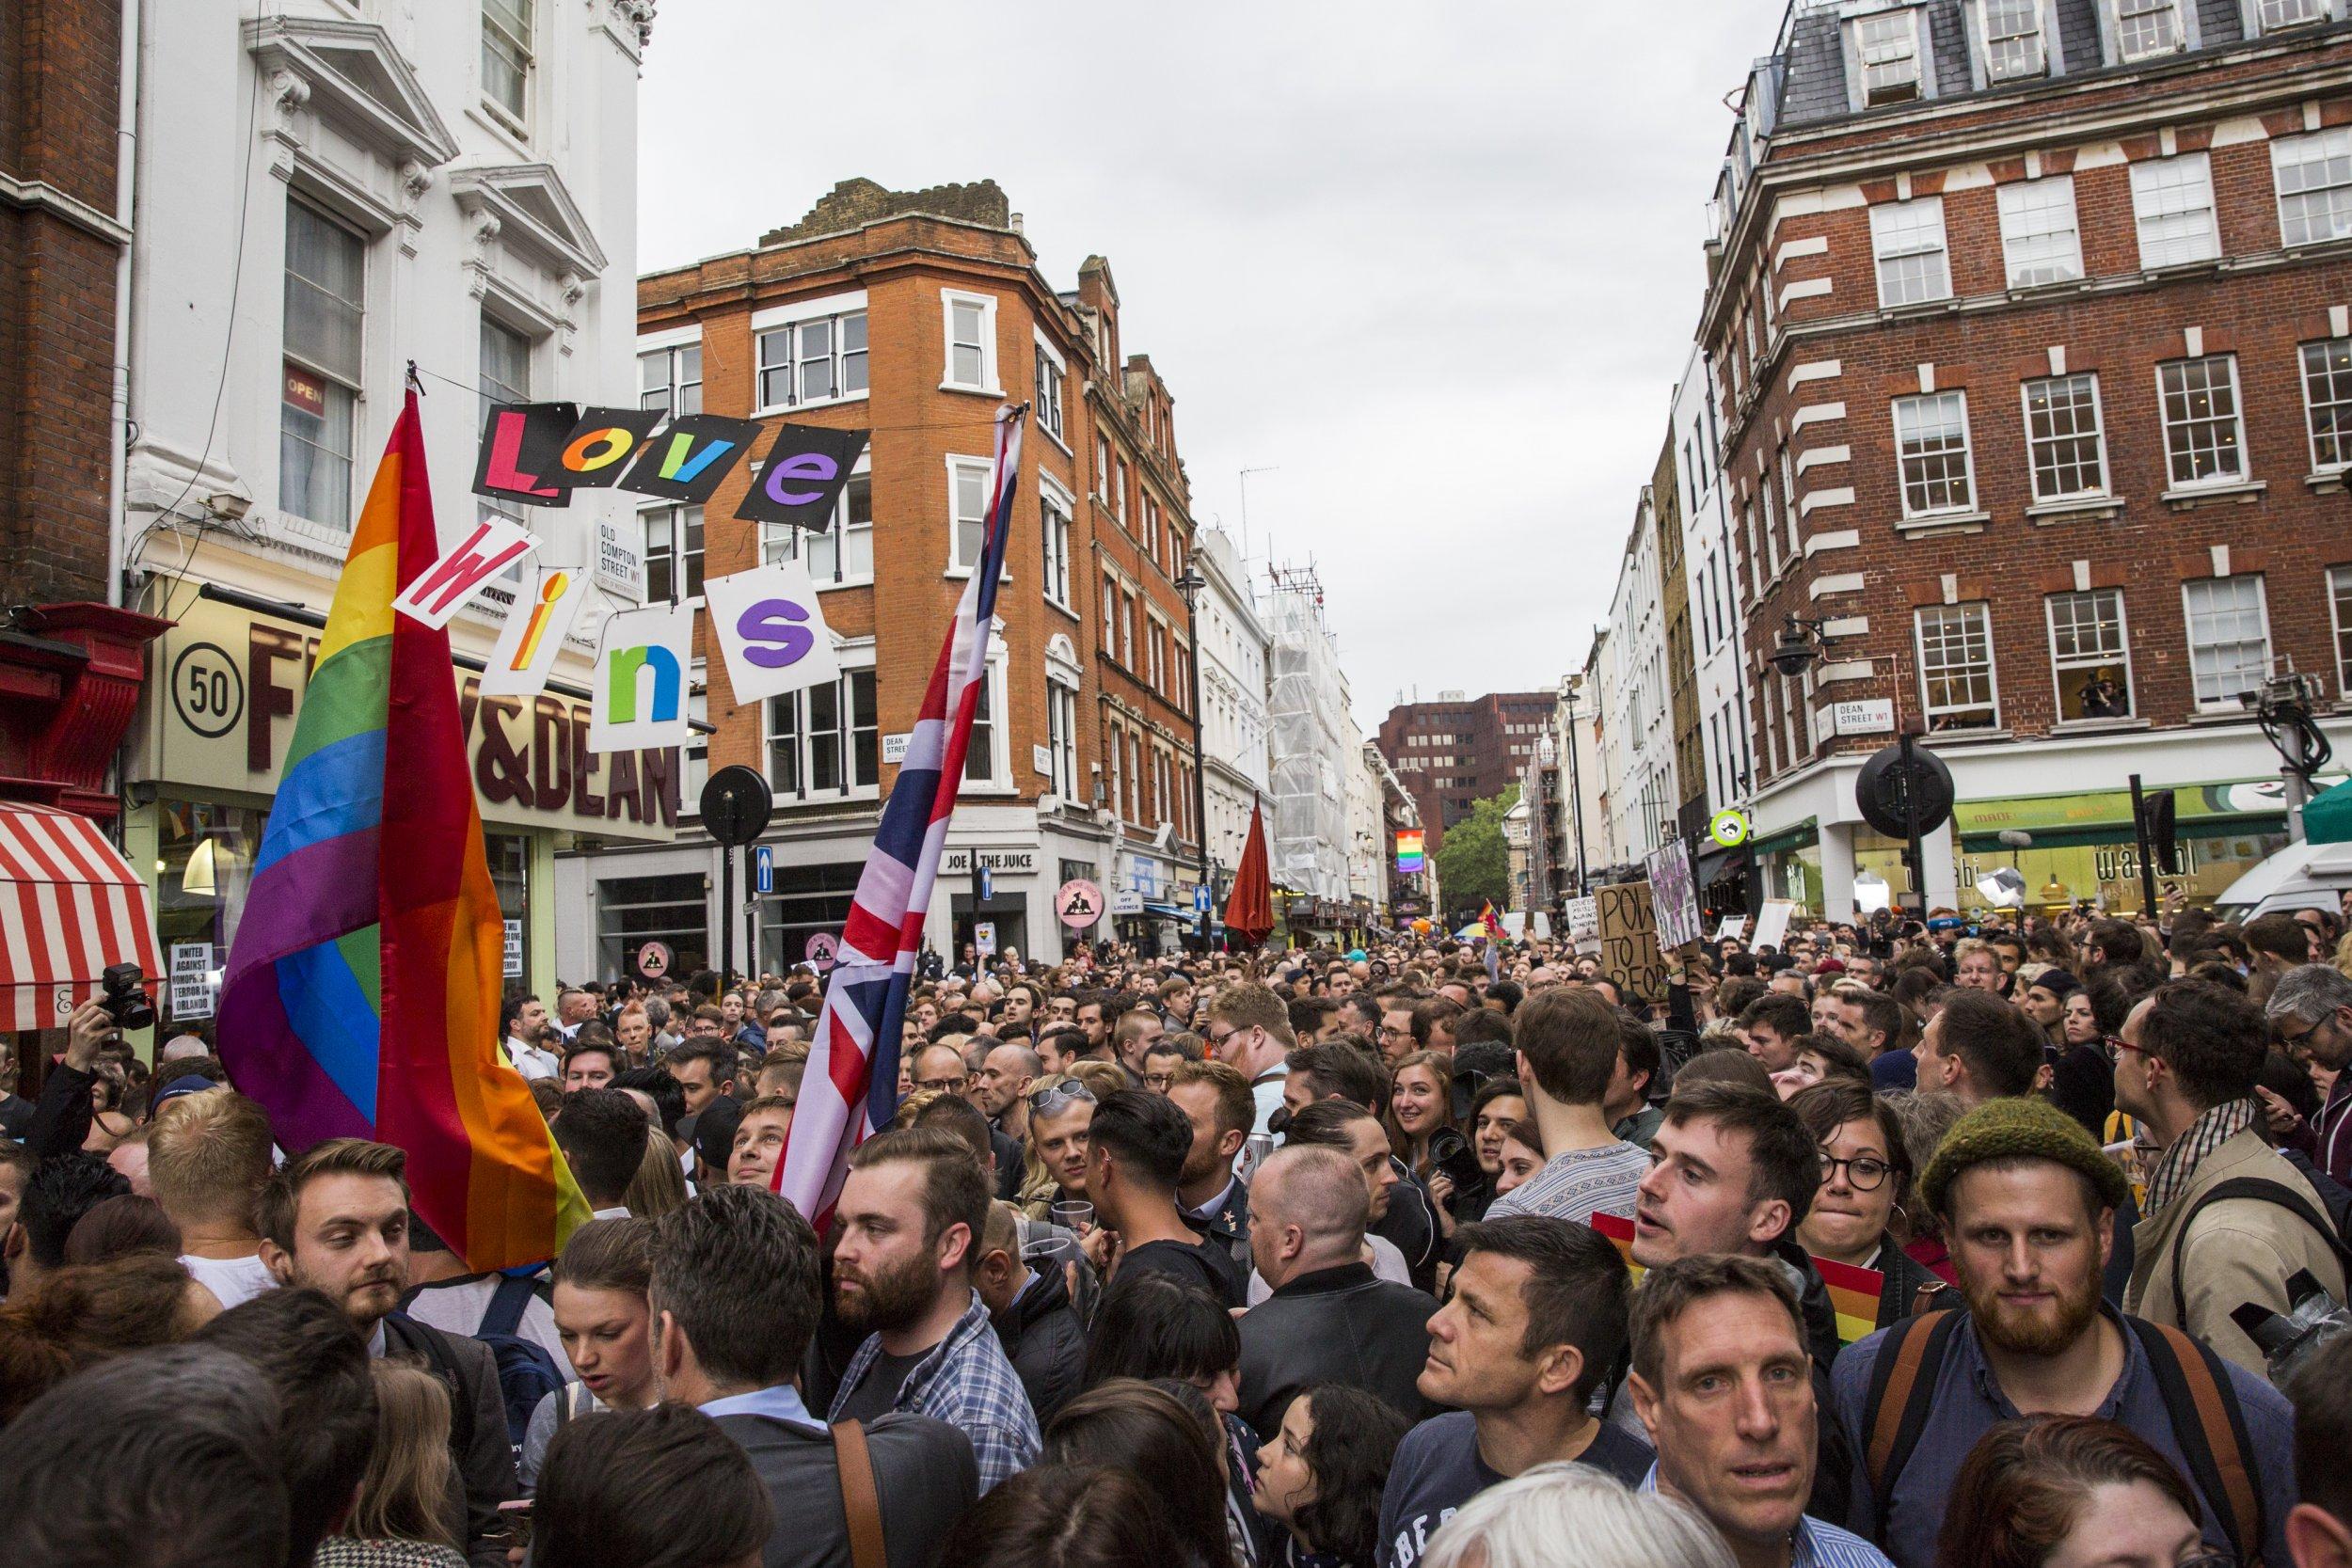 London's Orlando vigil in Old Compton Street